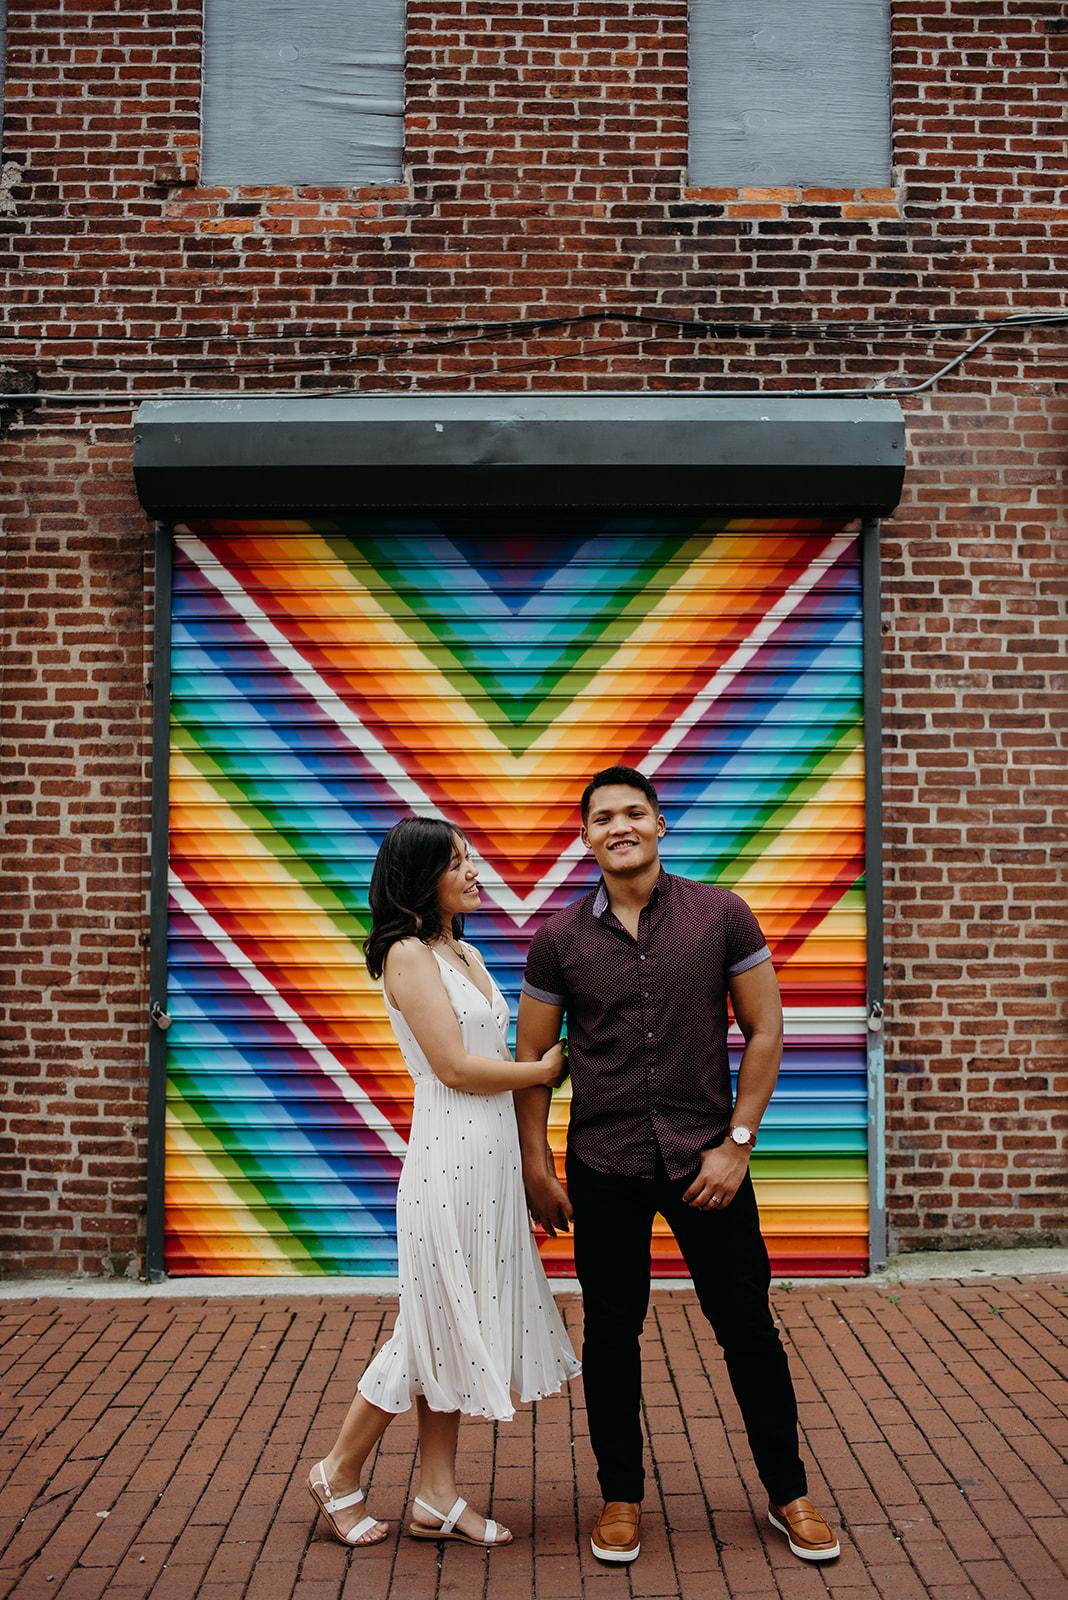 Washington DC love mural engagement session colorful rainbow